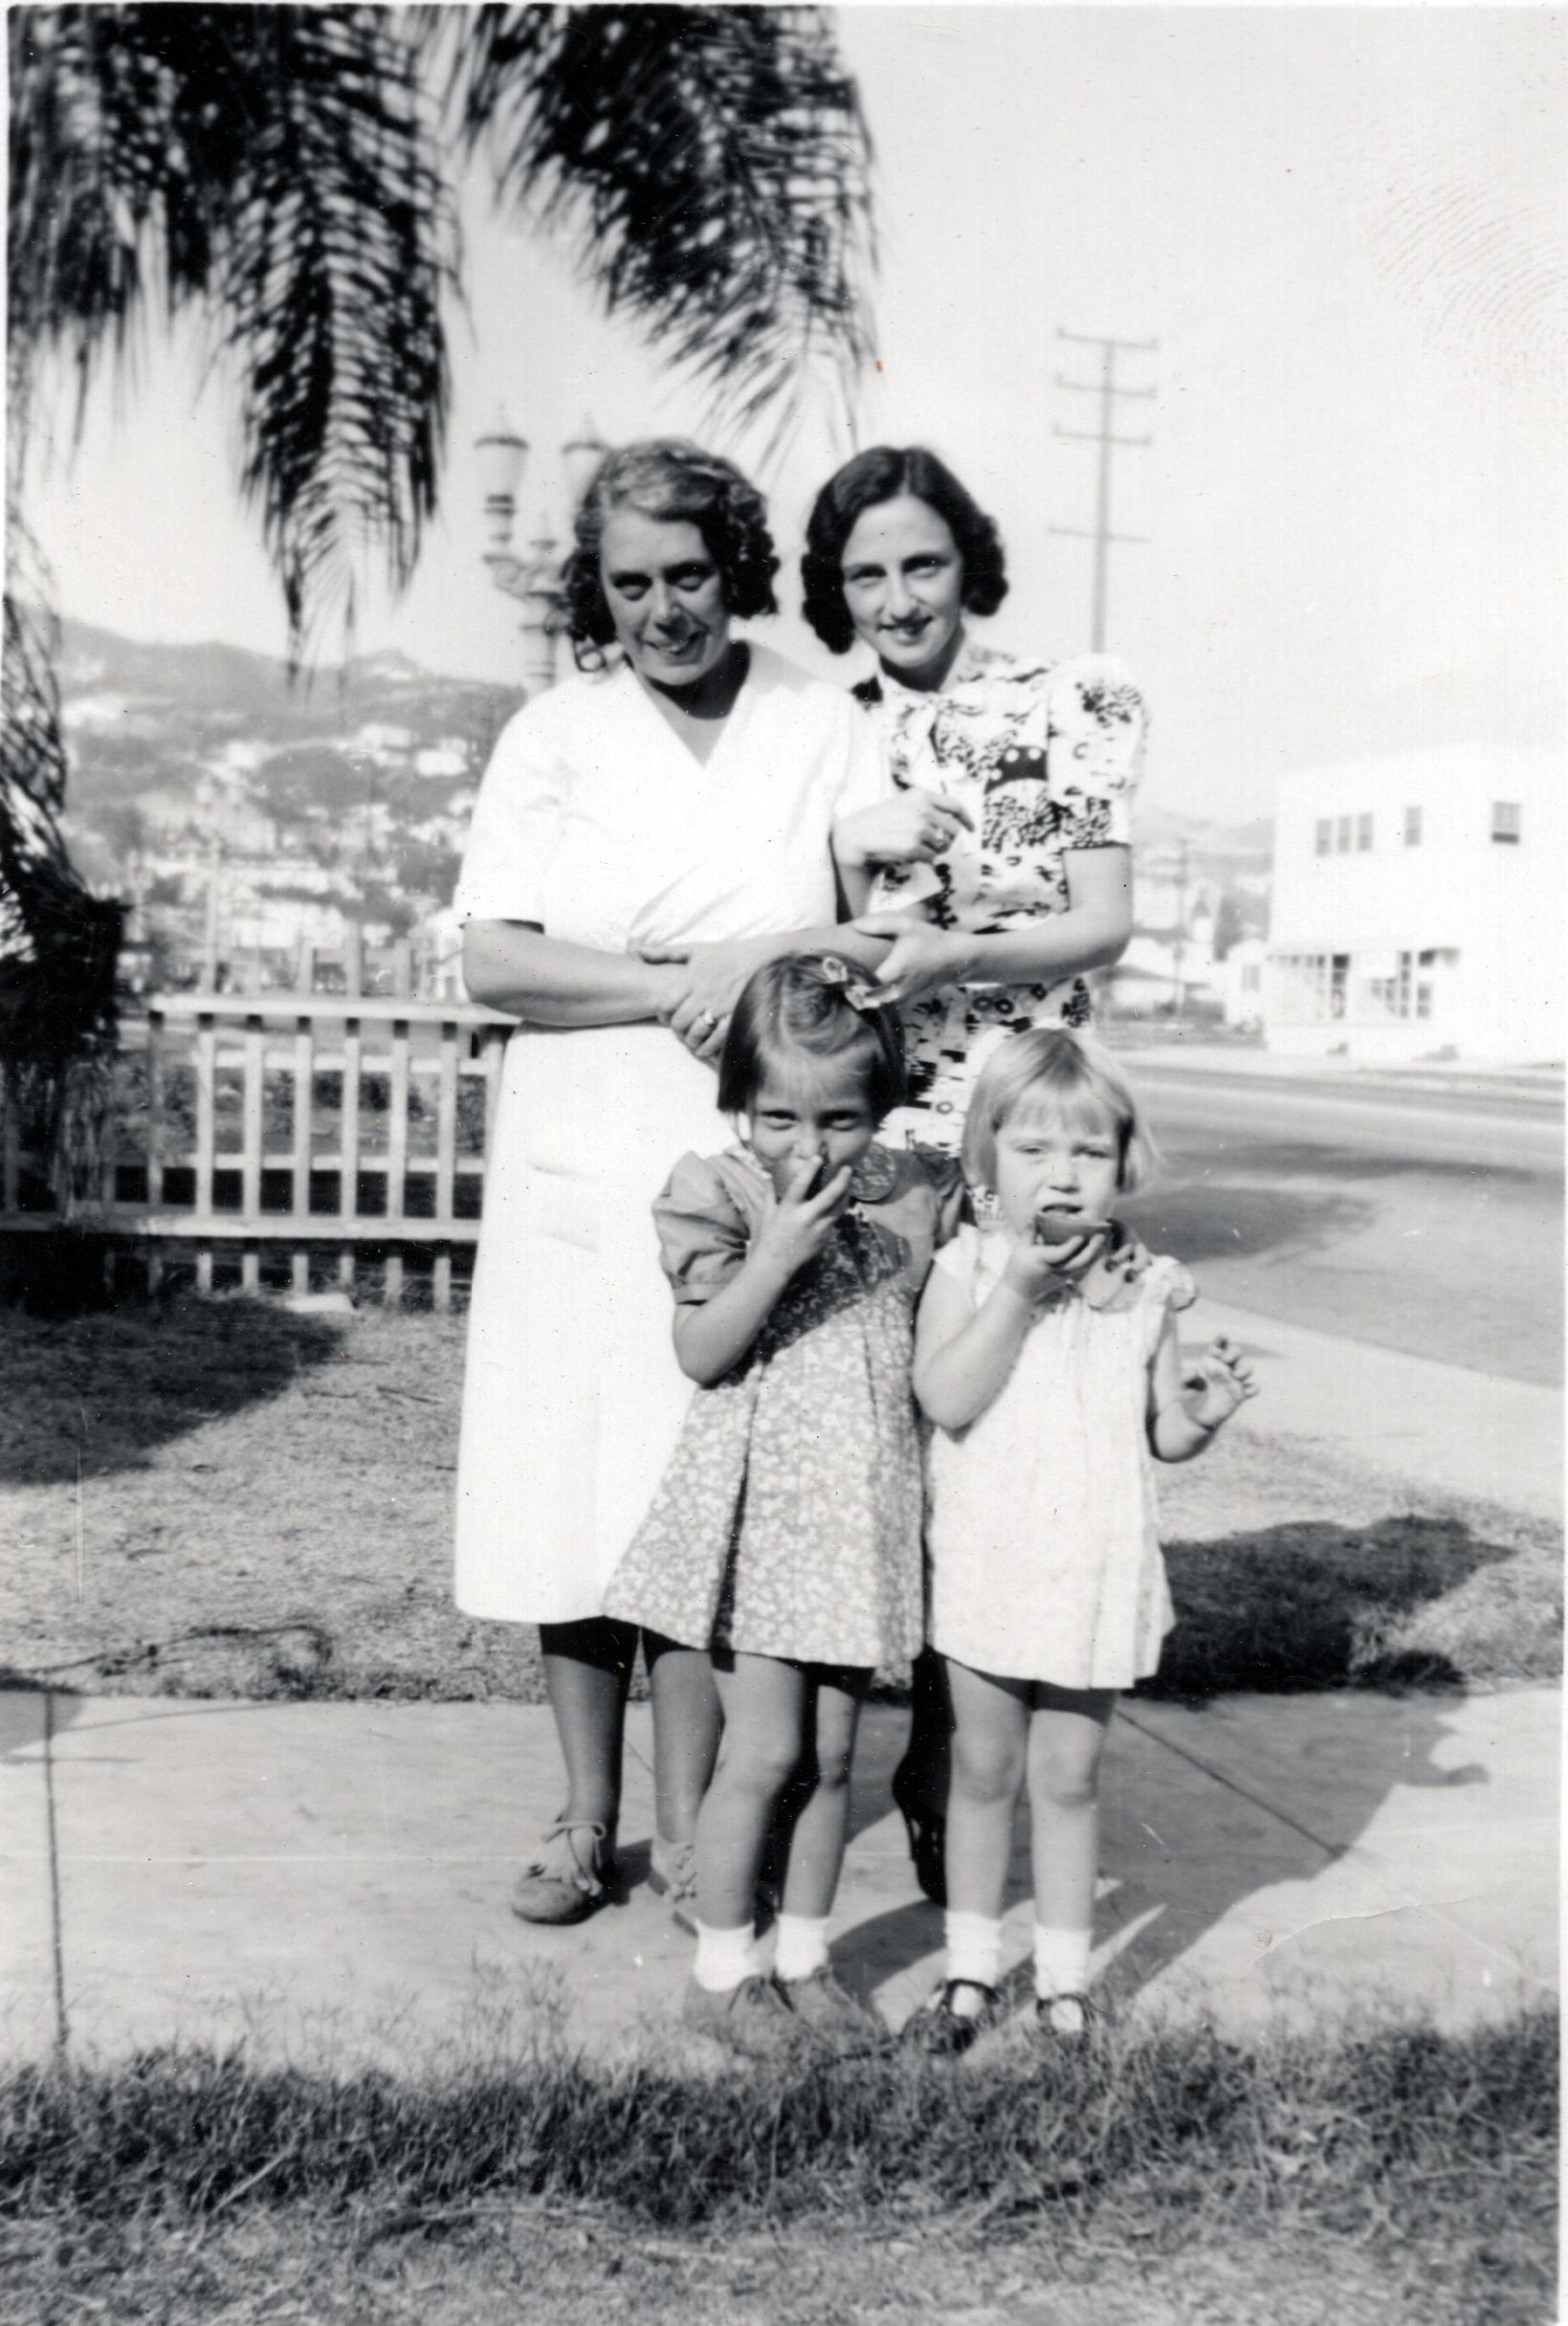 Gram, Darlene & Friends